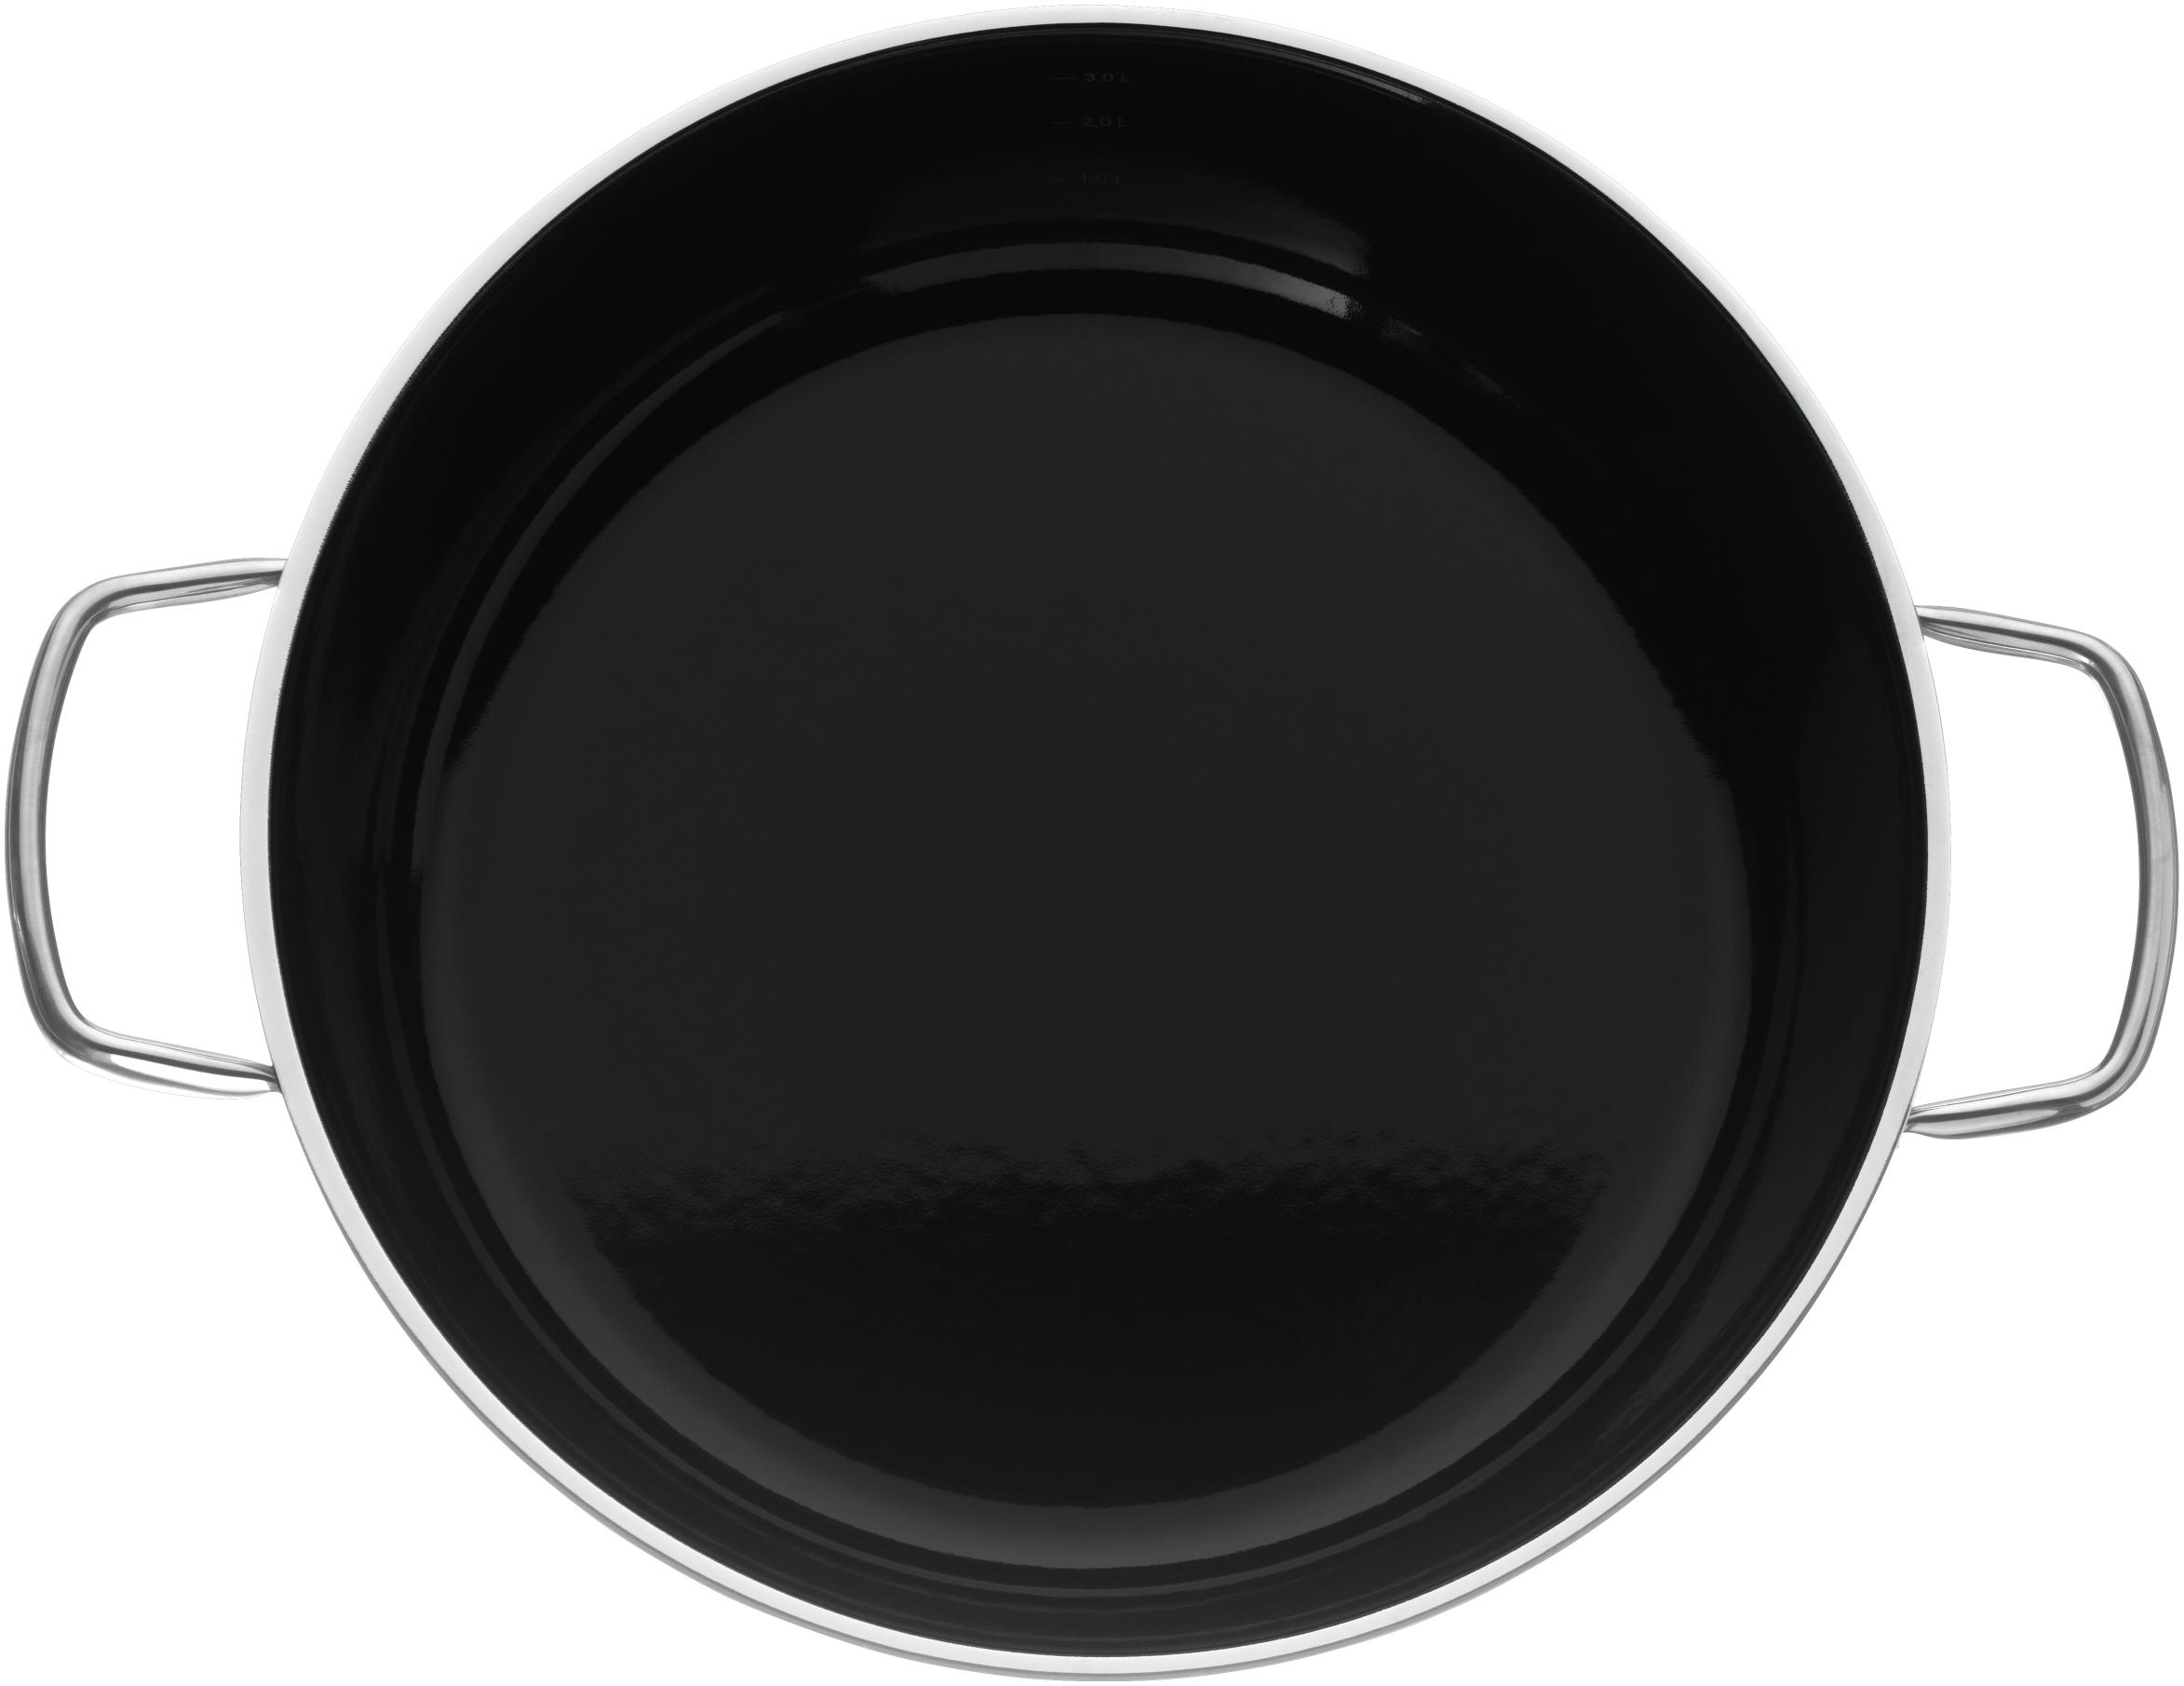 WMF Fusiontec Pilav Tenceresi 28 Cm Siyah